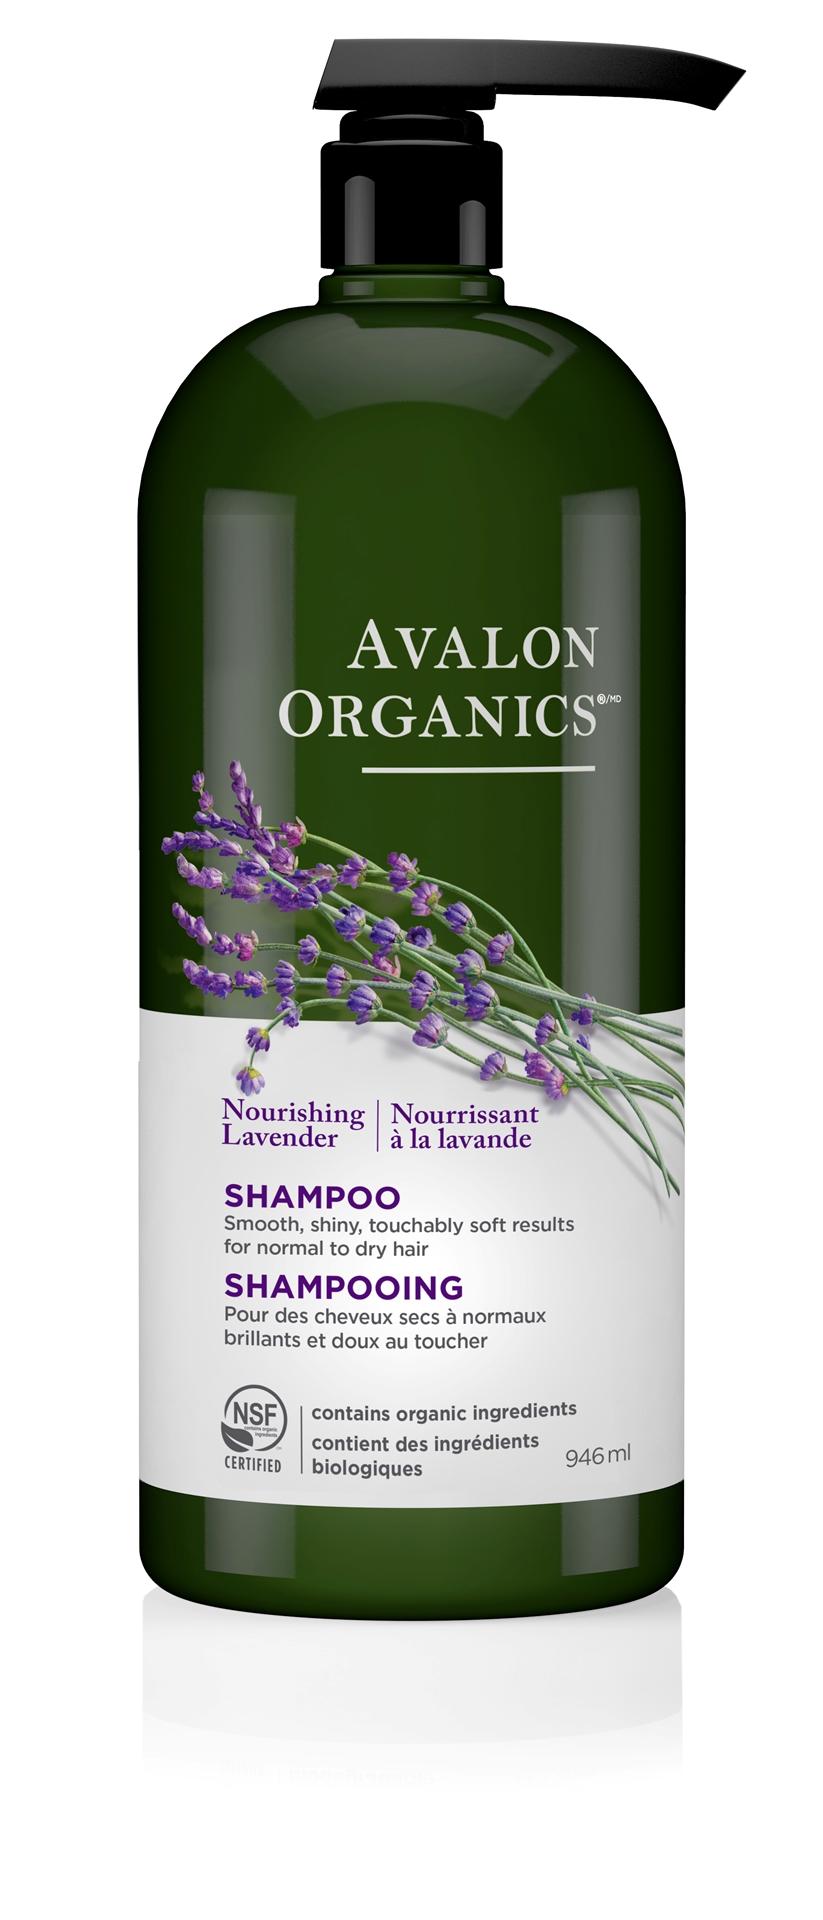 Avalon Organics Nourishing Shampoo, Lavender 946ml   BuyWell.com - Canada's online vitamin, beauty & health store.